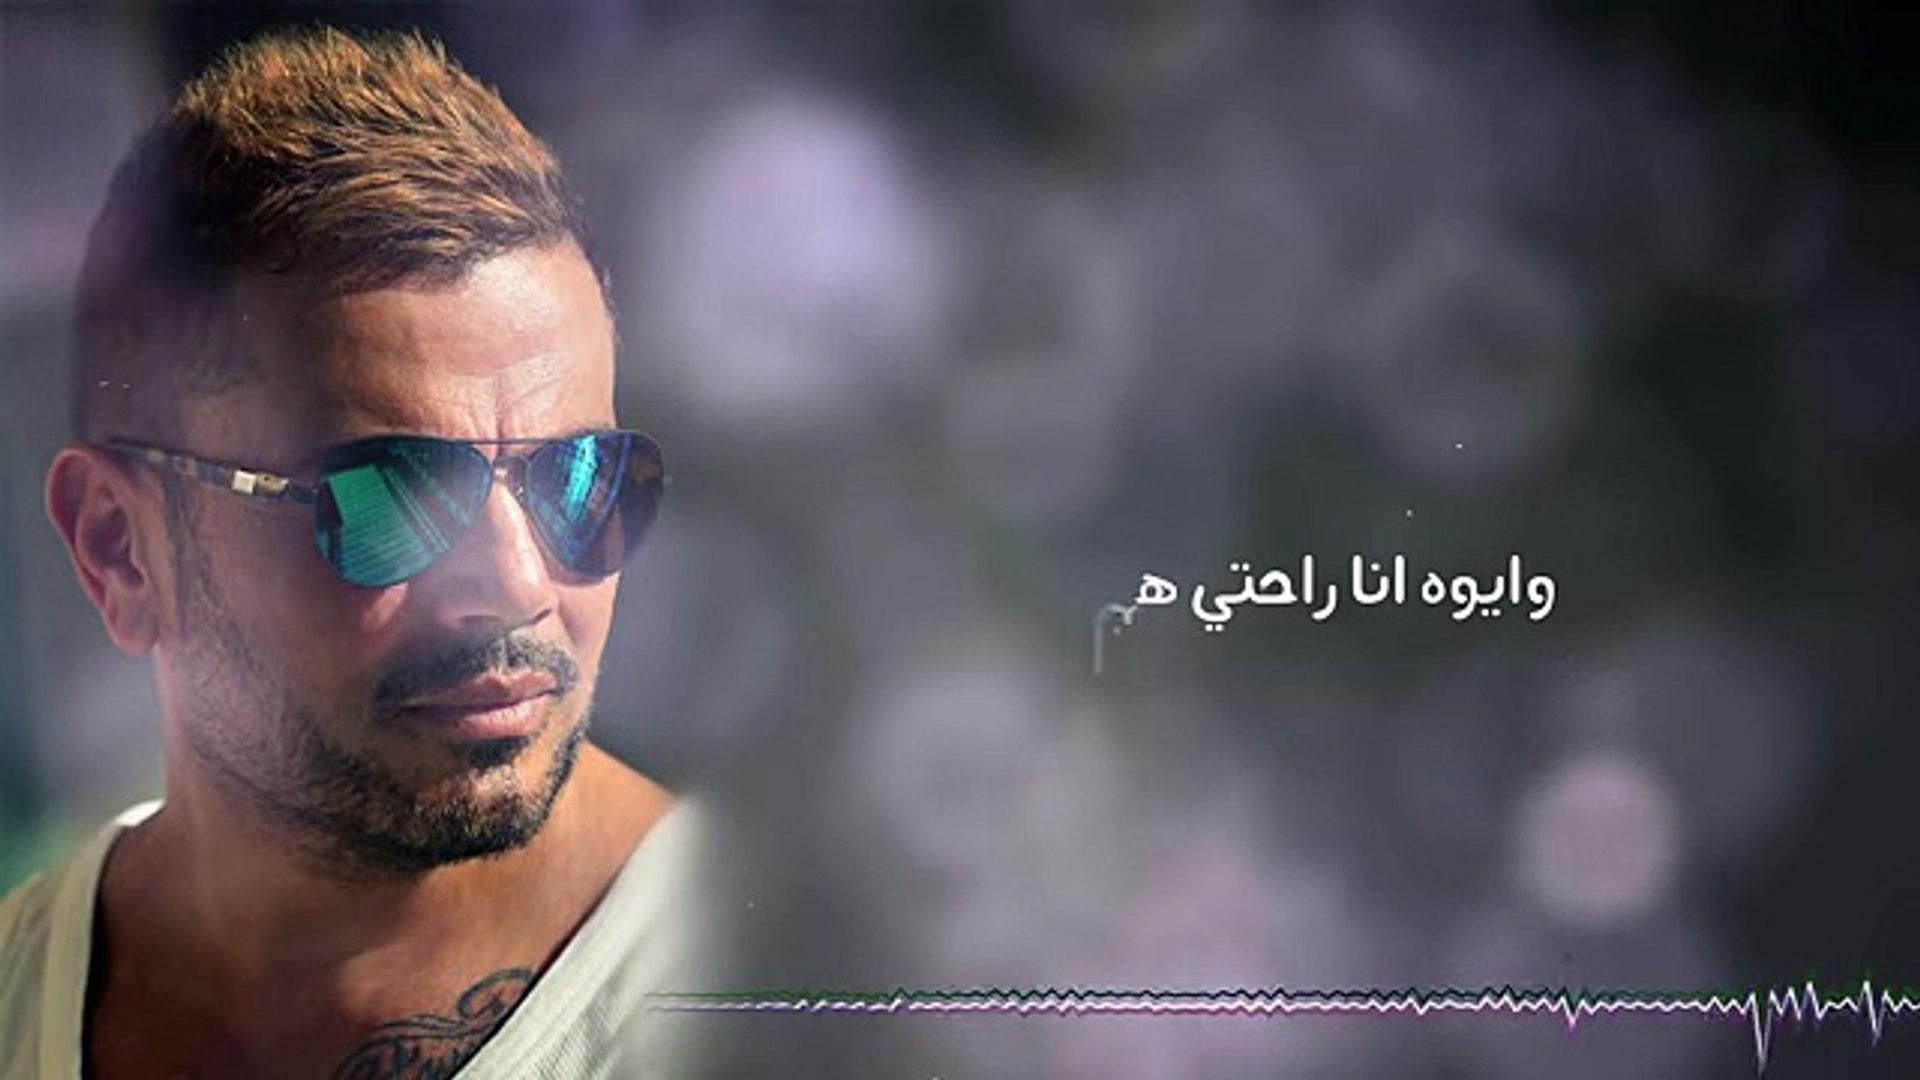 Amr Diab Bahebak Ana عمرو دياب بحبك أنا 2018